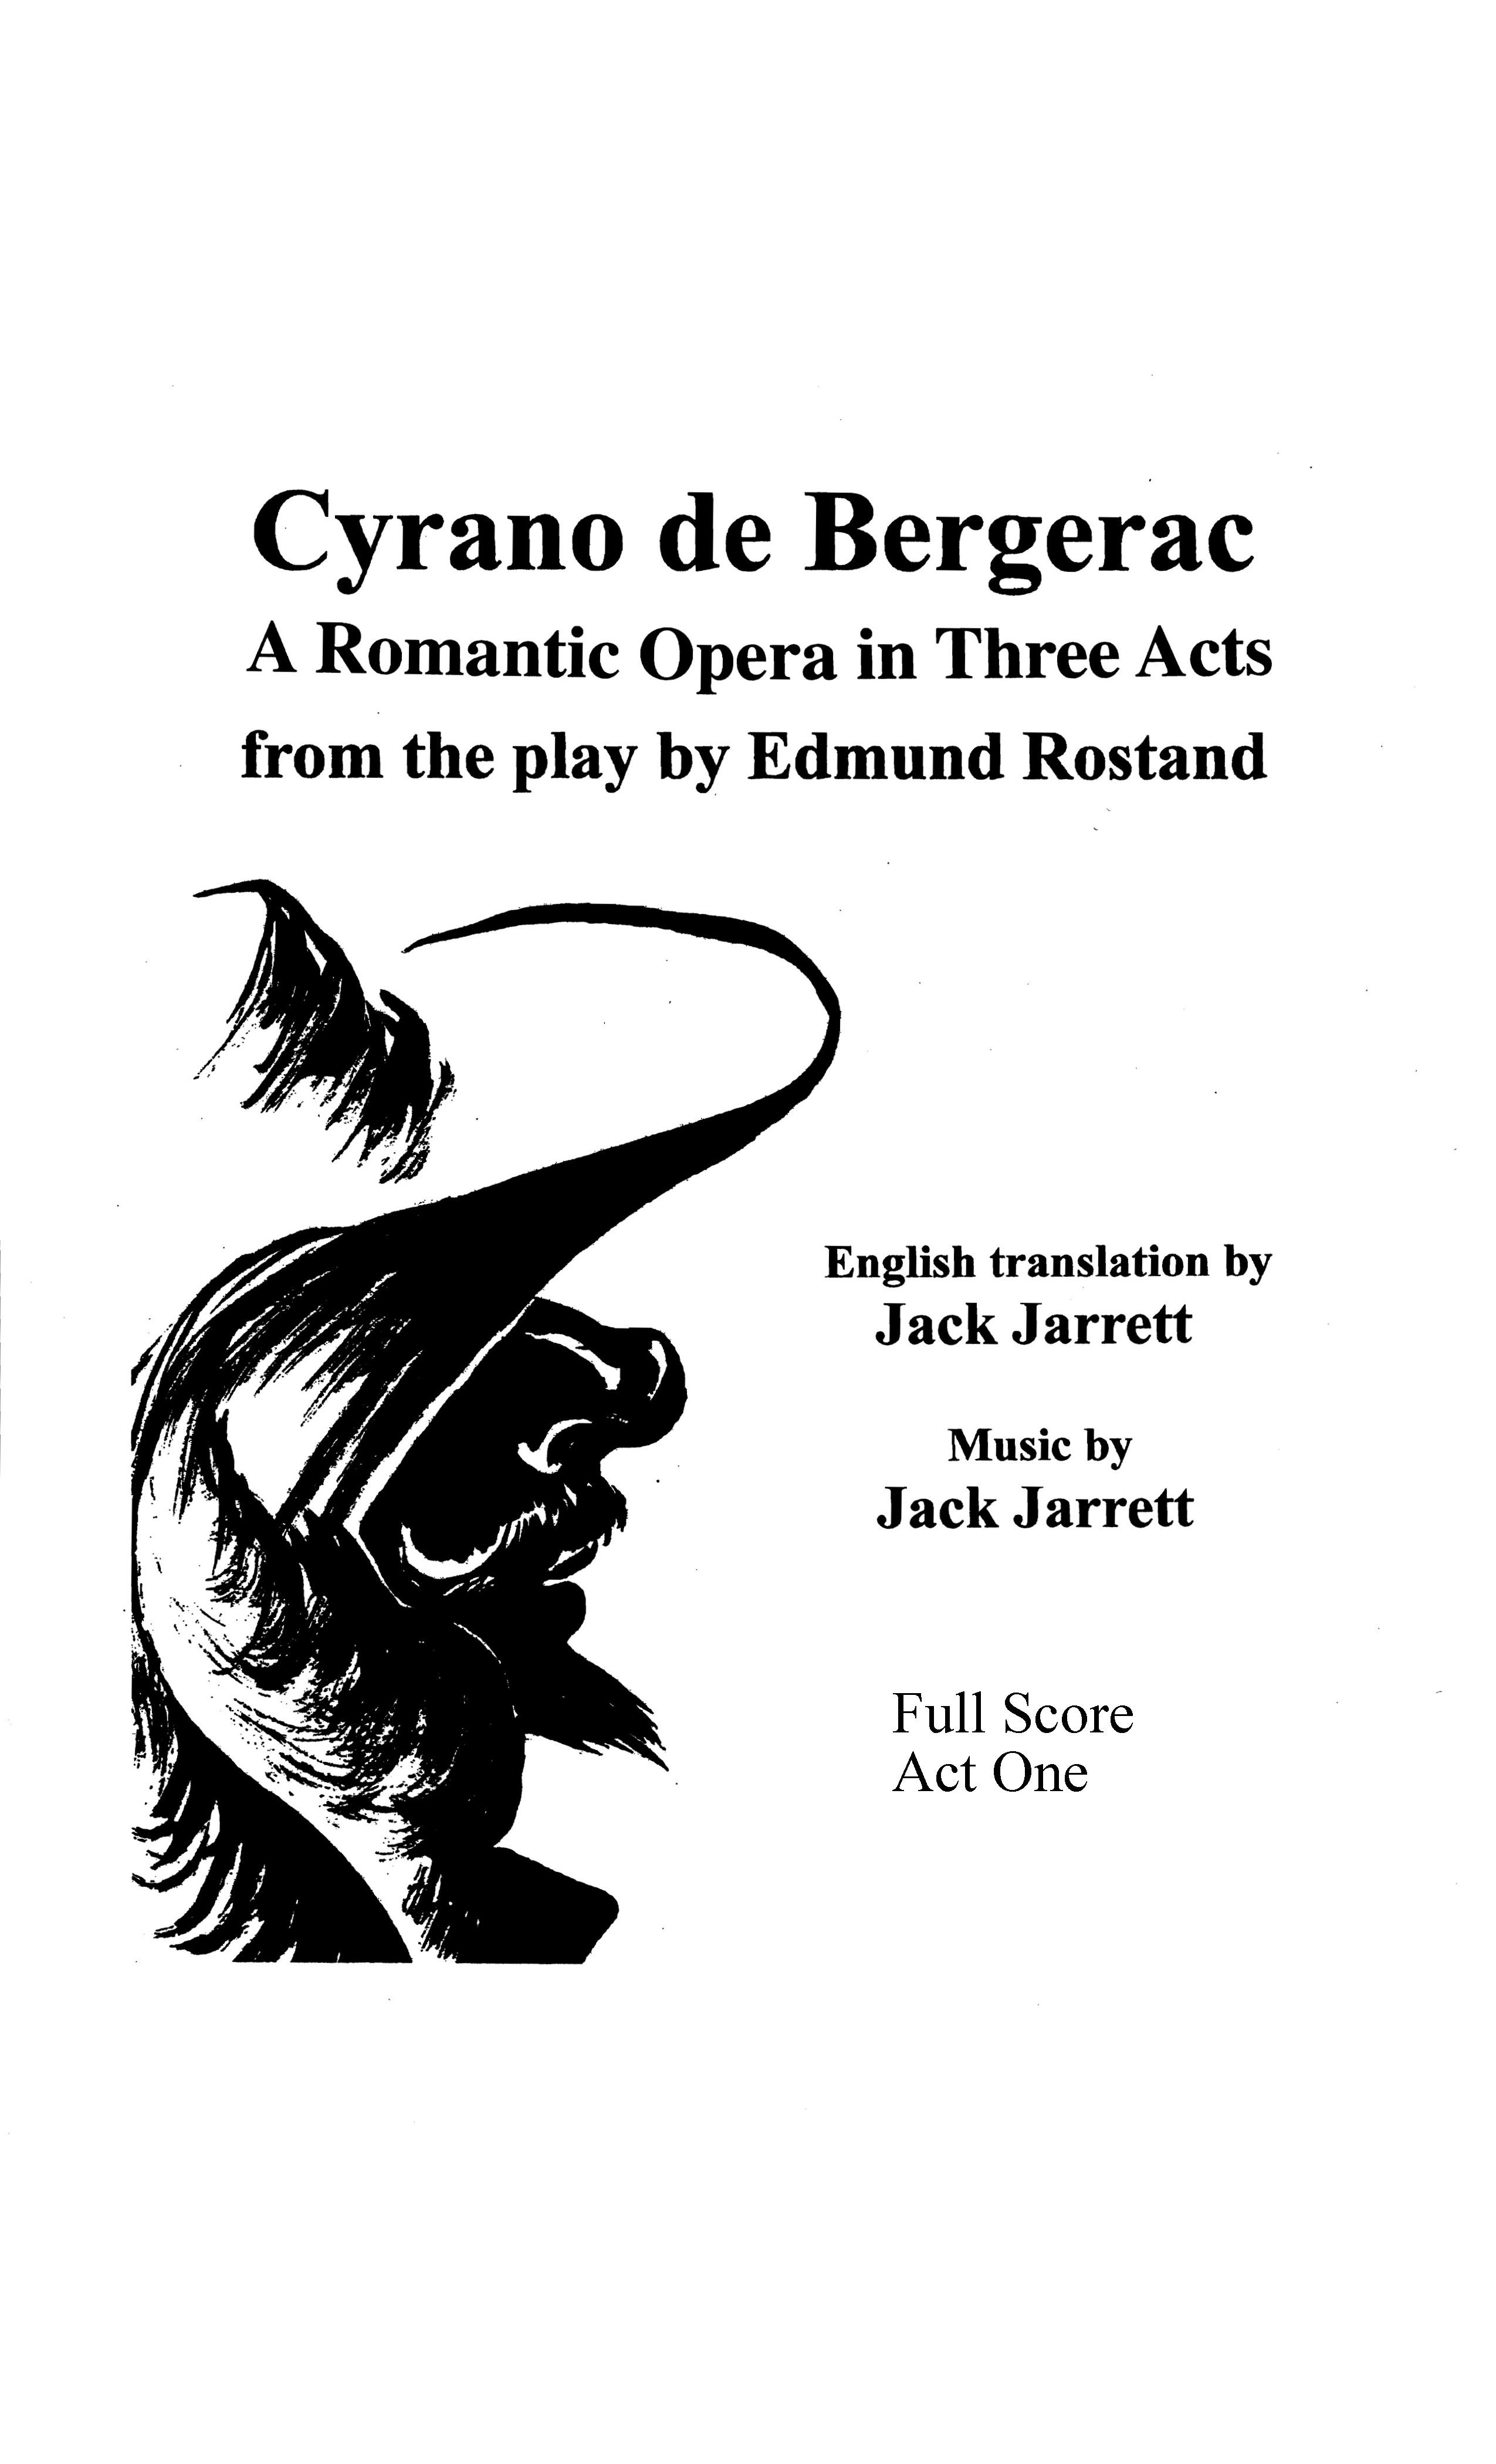 Cyrano de Bergerac Act One - Score and Parts